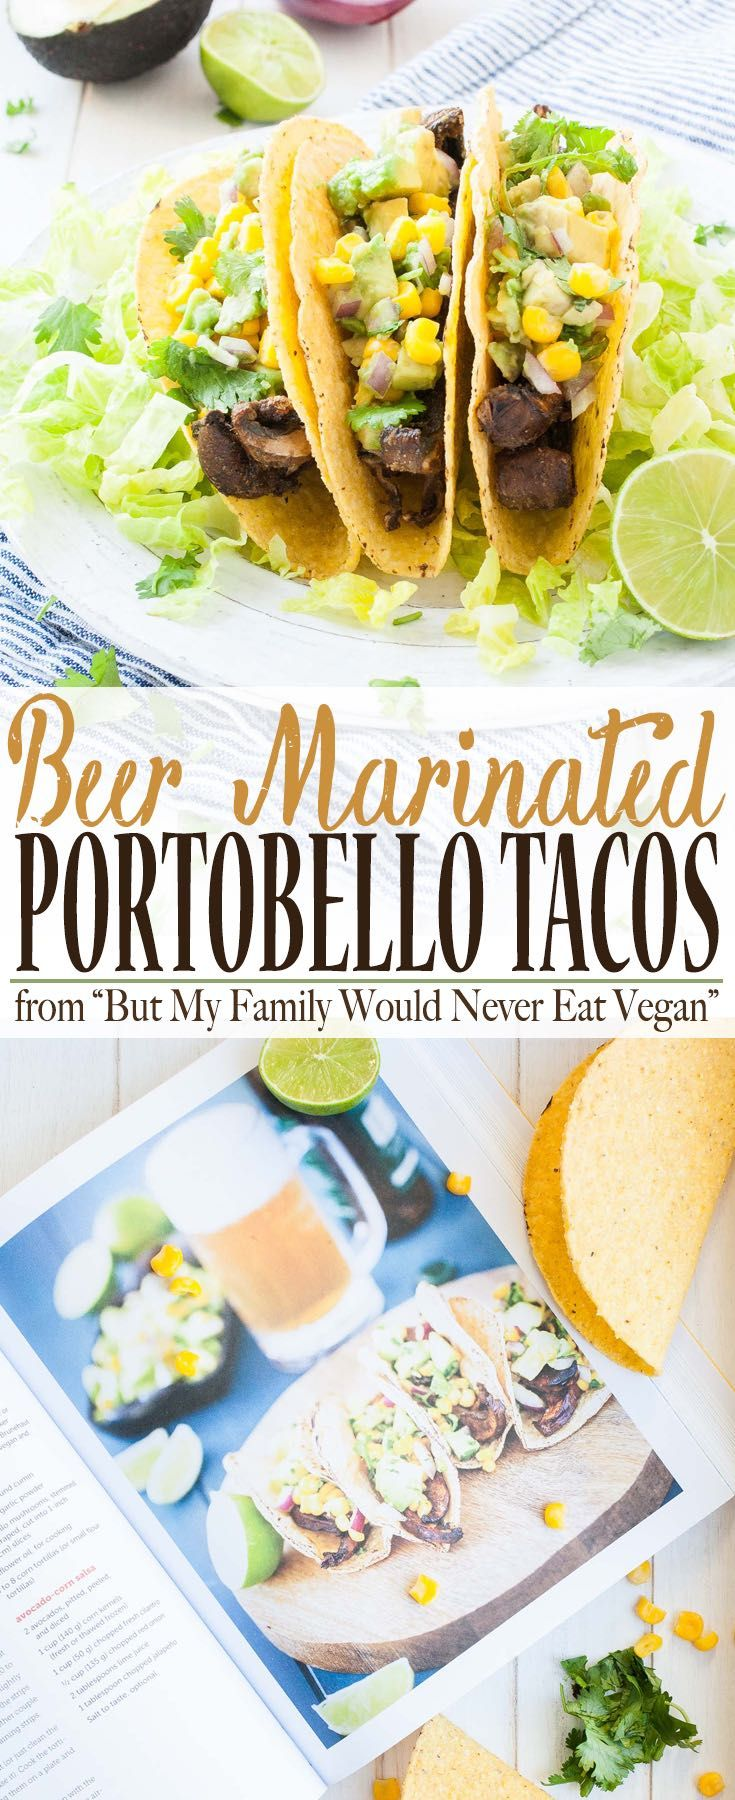 Beer-Marinated Portobello Mushroom Tacos | www.veggiesdontbite | #vegan #plantbased #glutenfree #BMFWNEVcookbook via @veggiesdontbite